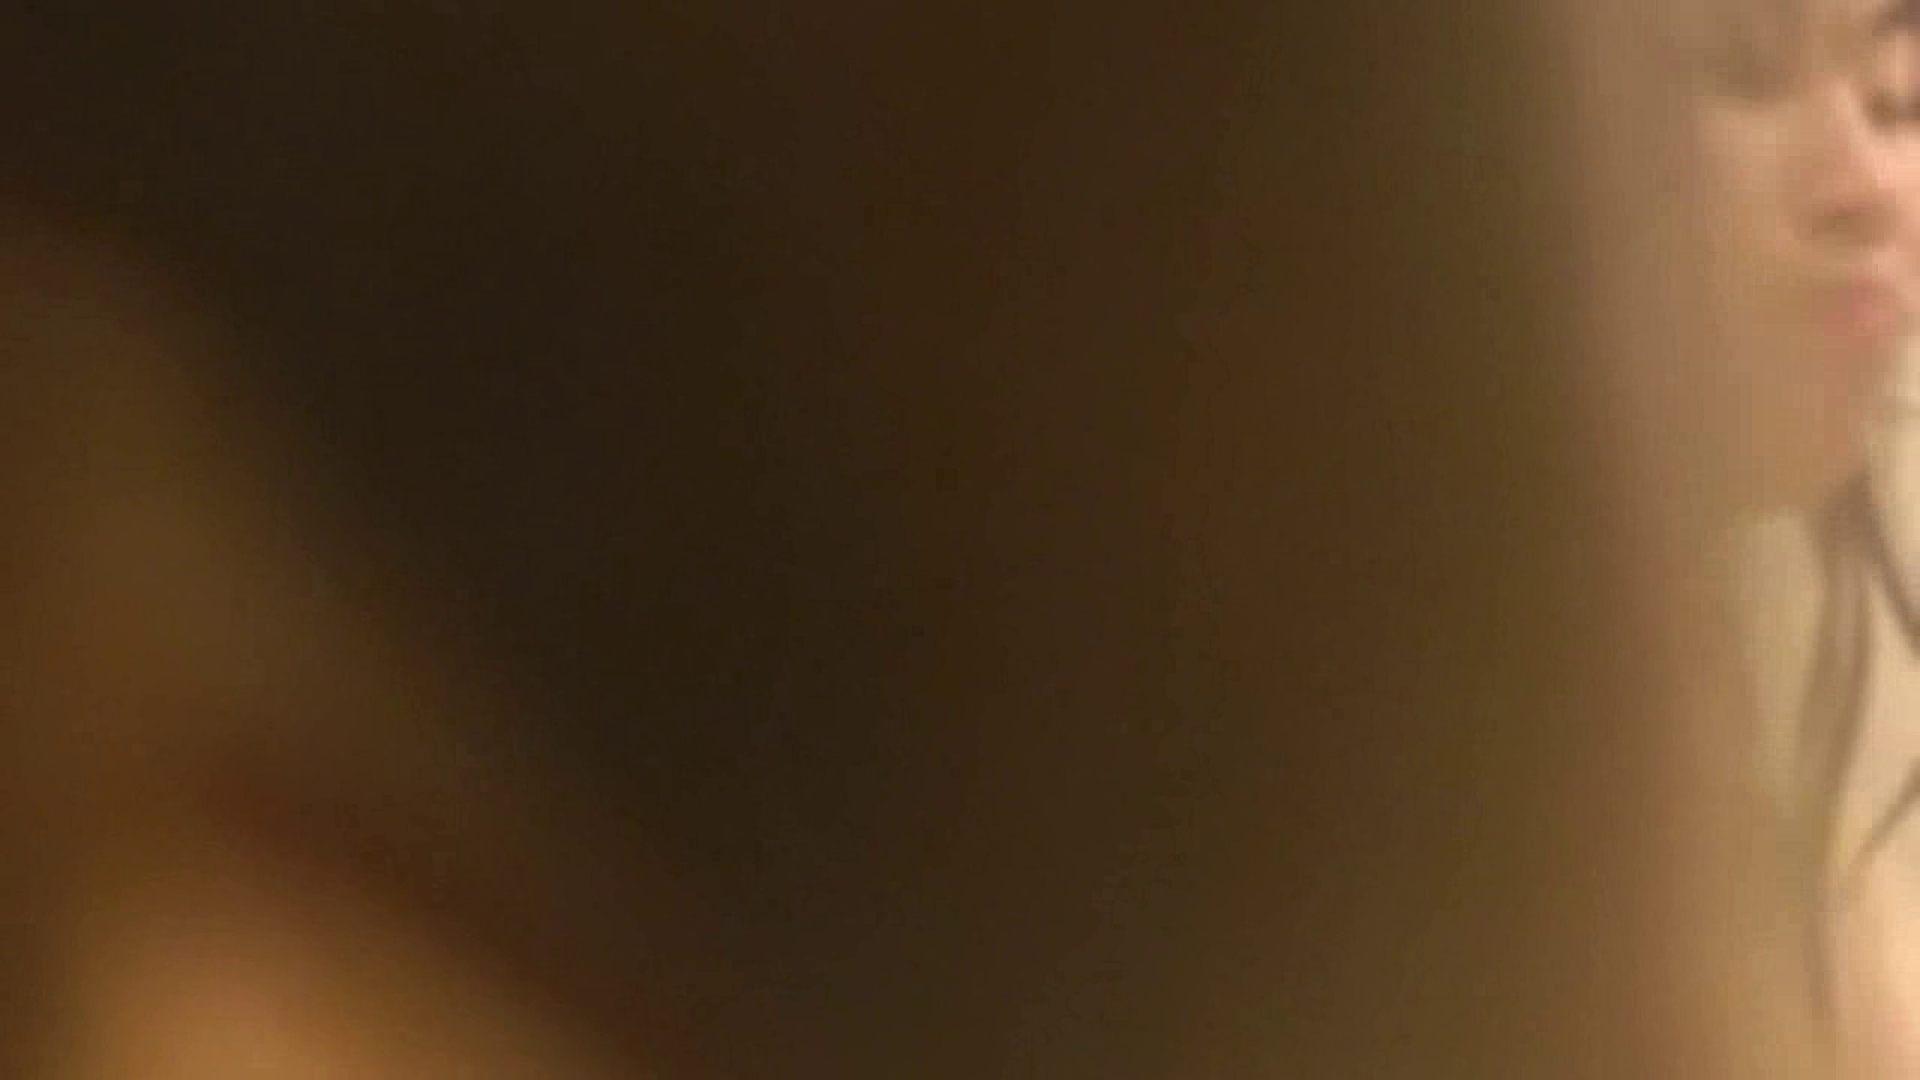 vol.1 Mayumi 窓越しに入浴シーン撮影に成功 入浴中の女性  57PIX 26